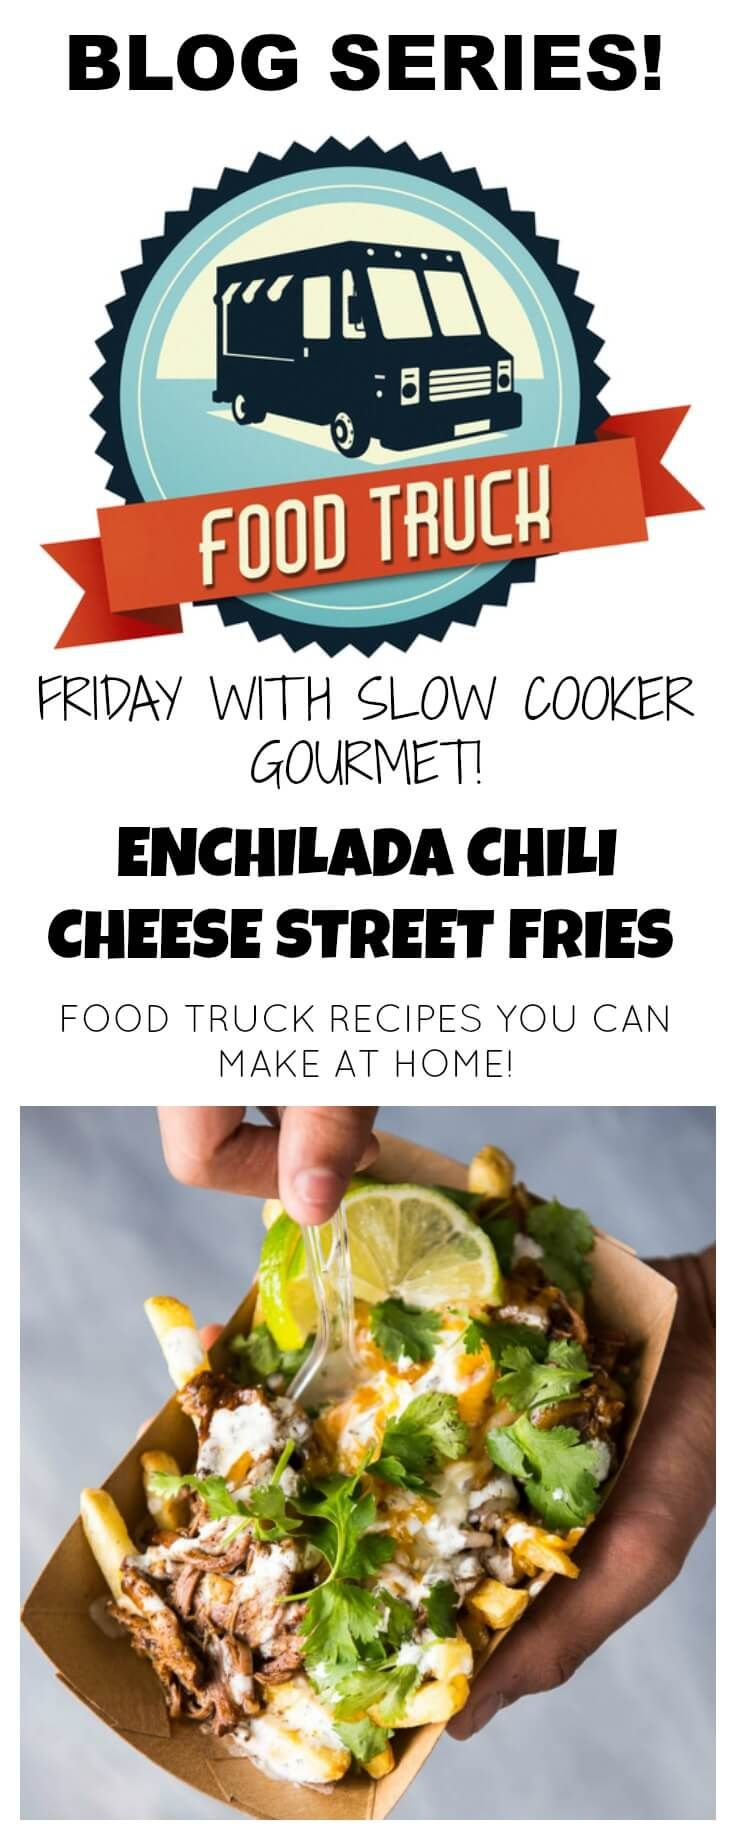 Slow cooker enchilada chili cheese street fries are a fun way to slow cooker enchilada chili cheese street fries are a fun way to bring food truck style forumfinder Choice Image